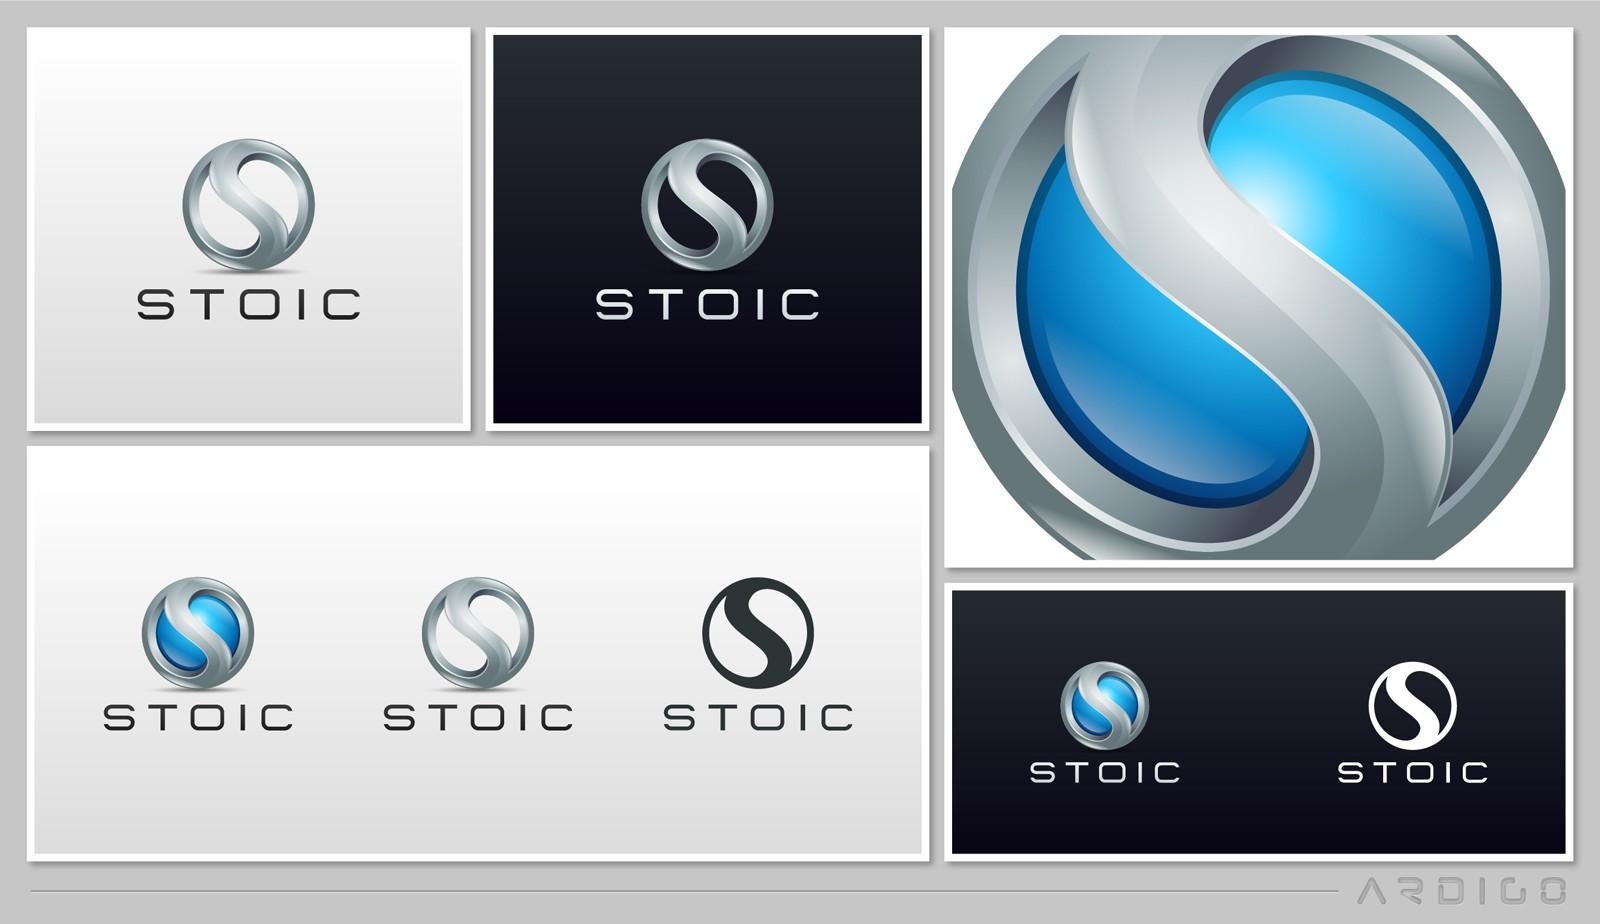 Stoic needs a new logo